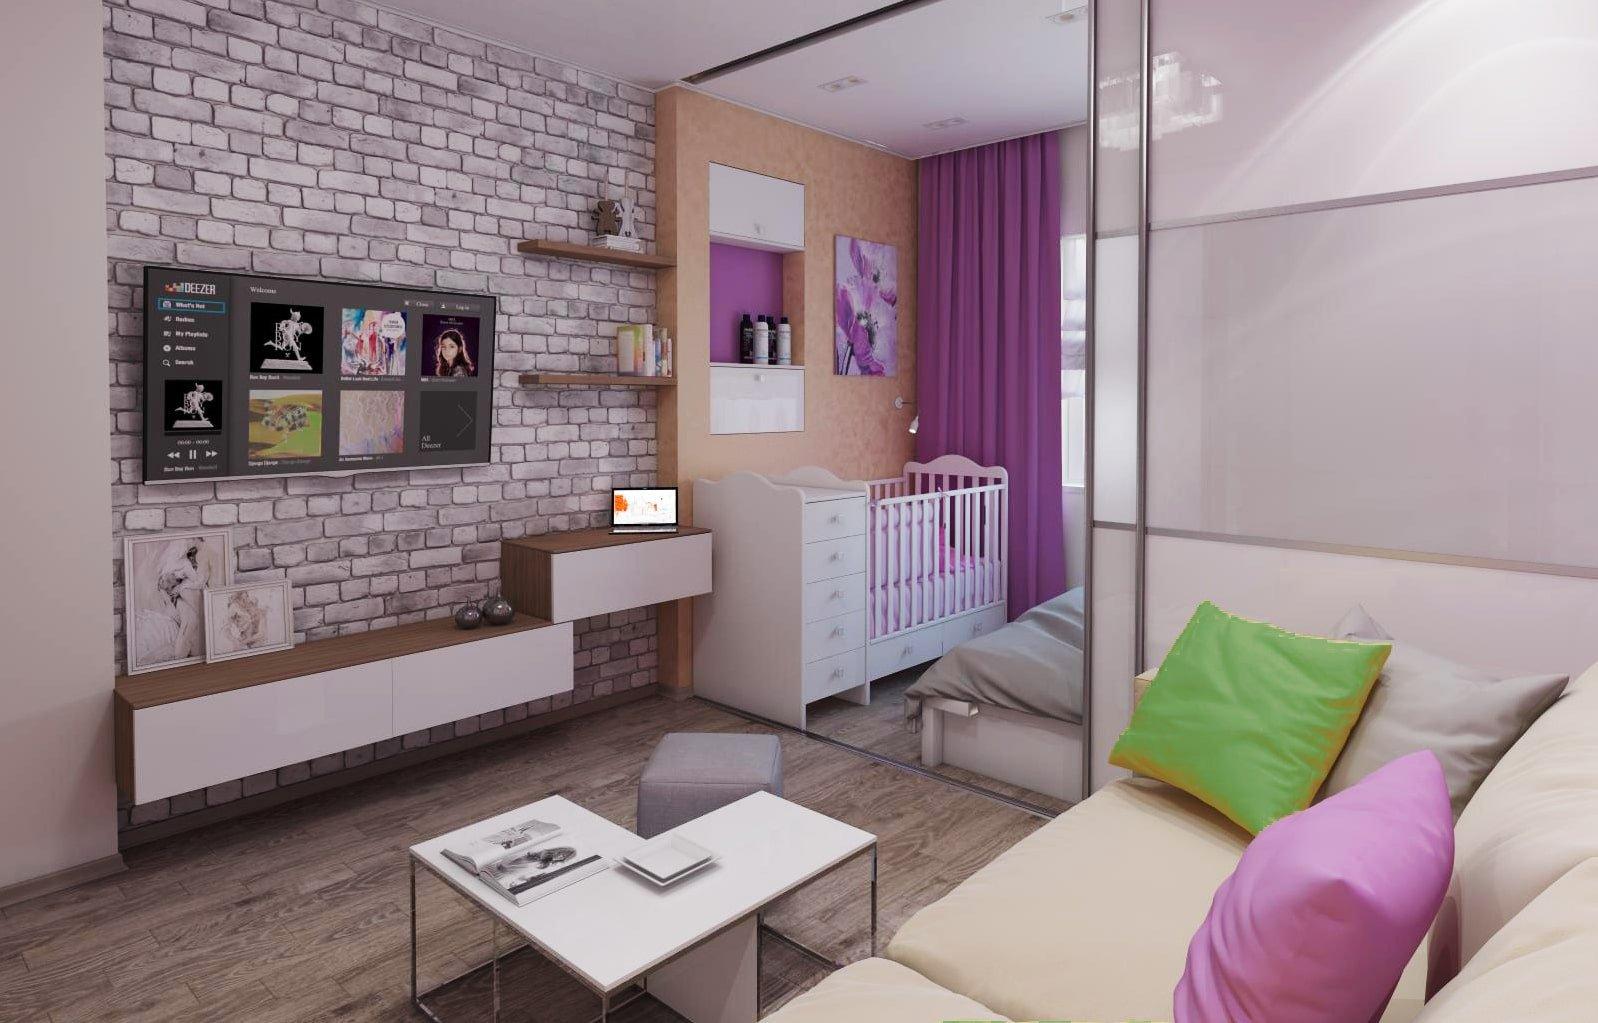 однокомнатная квартира 34 кв м с ребенком